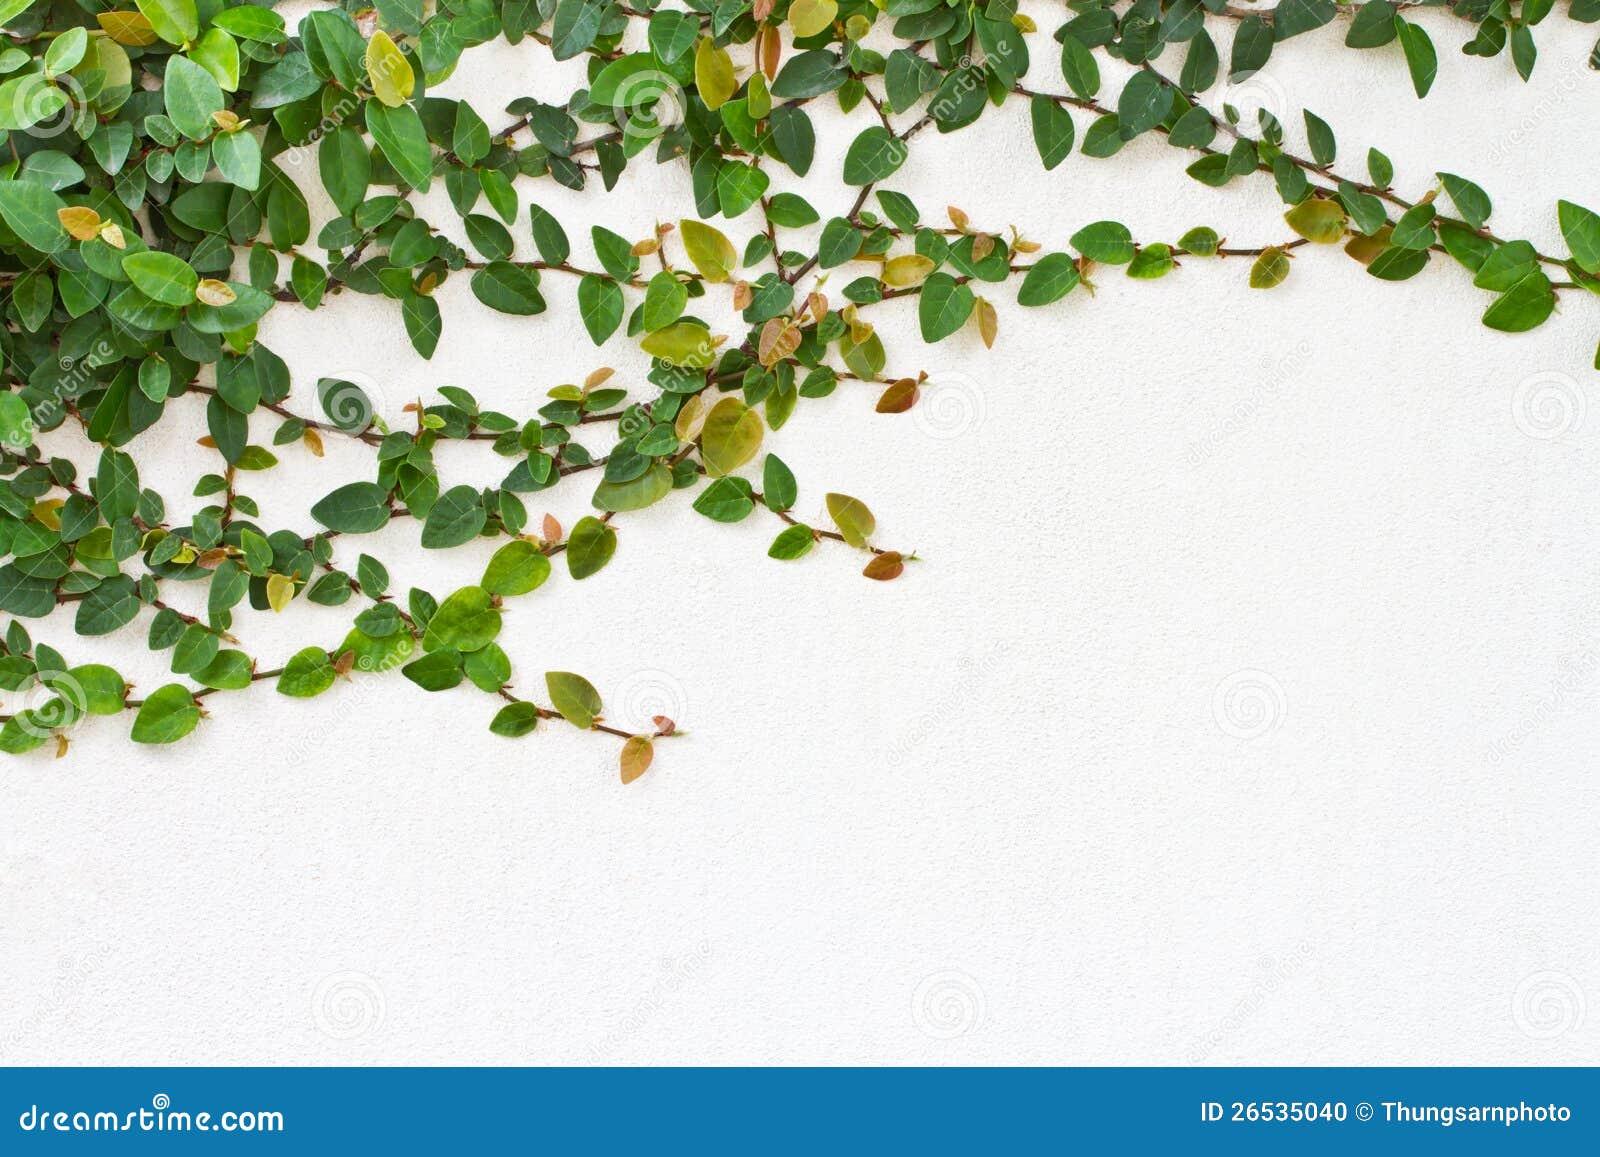 centrale verte de plante grimpante photo stock image 26535040. Black Bedroom Furniture Sets. Home Design Ideas